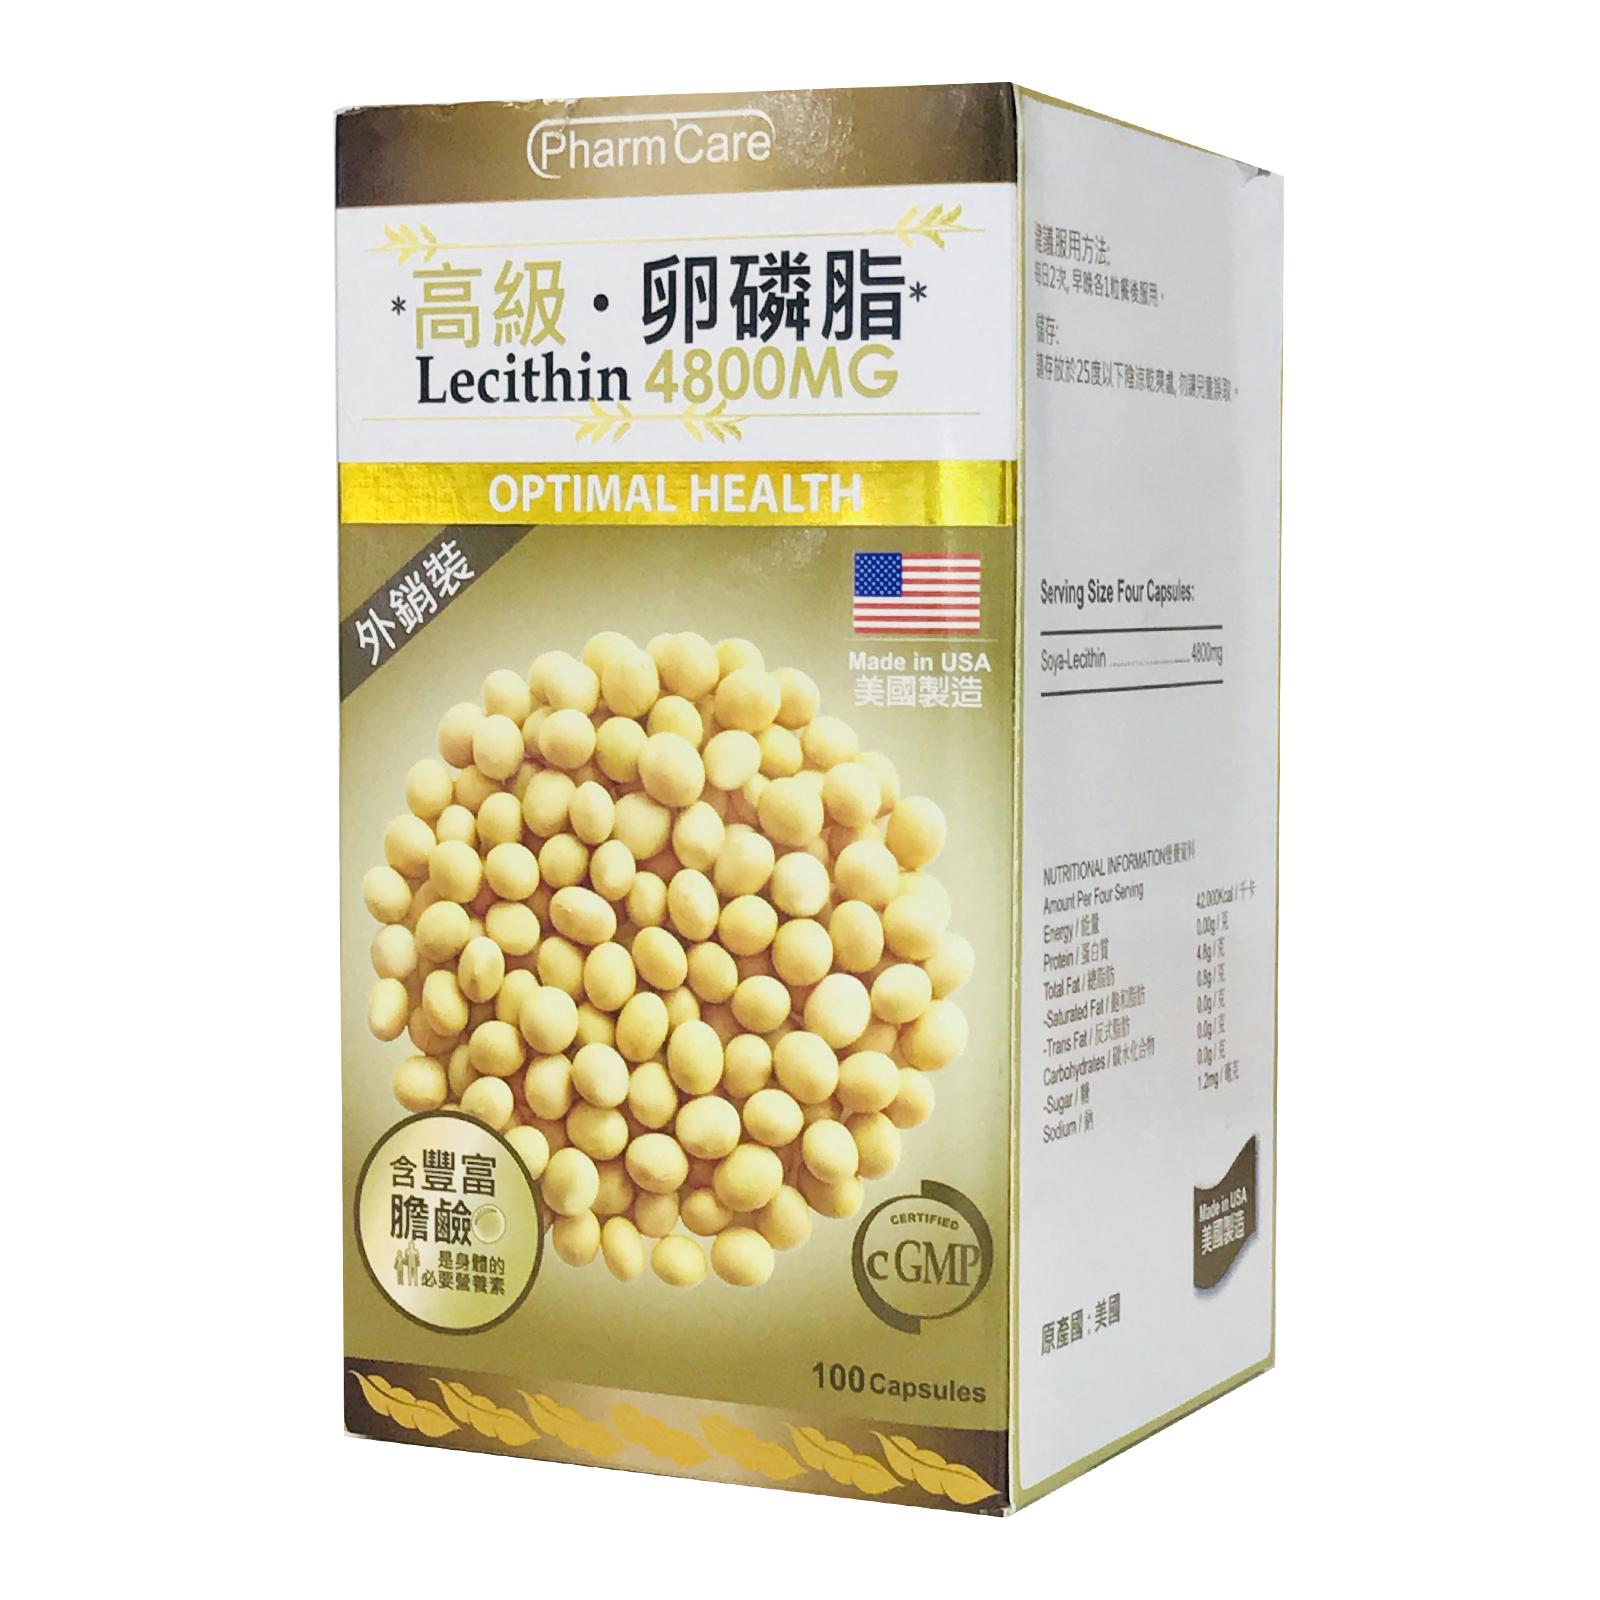 PharmCare高级卵磷脂 100粒